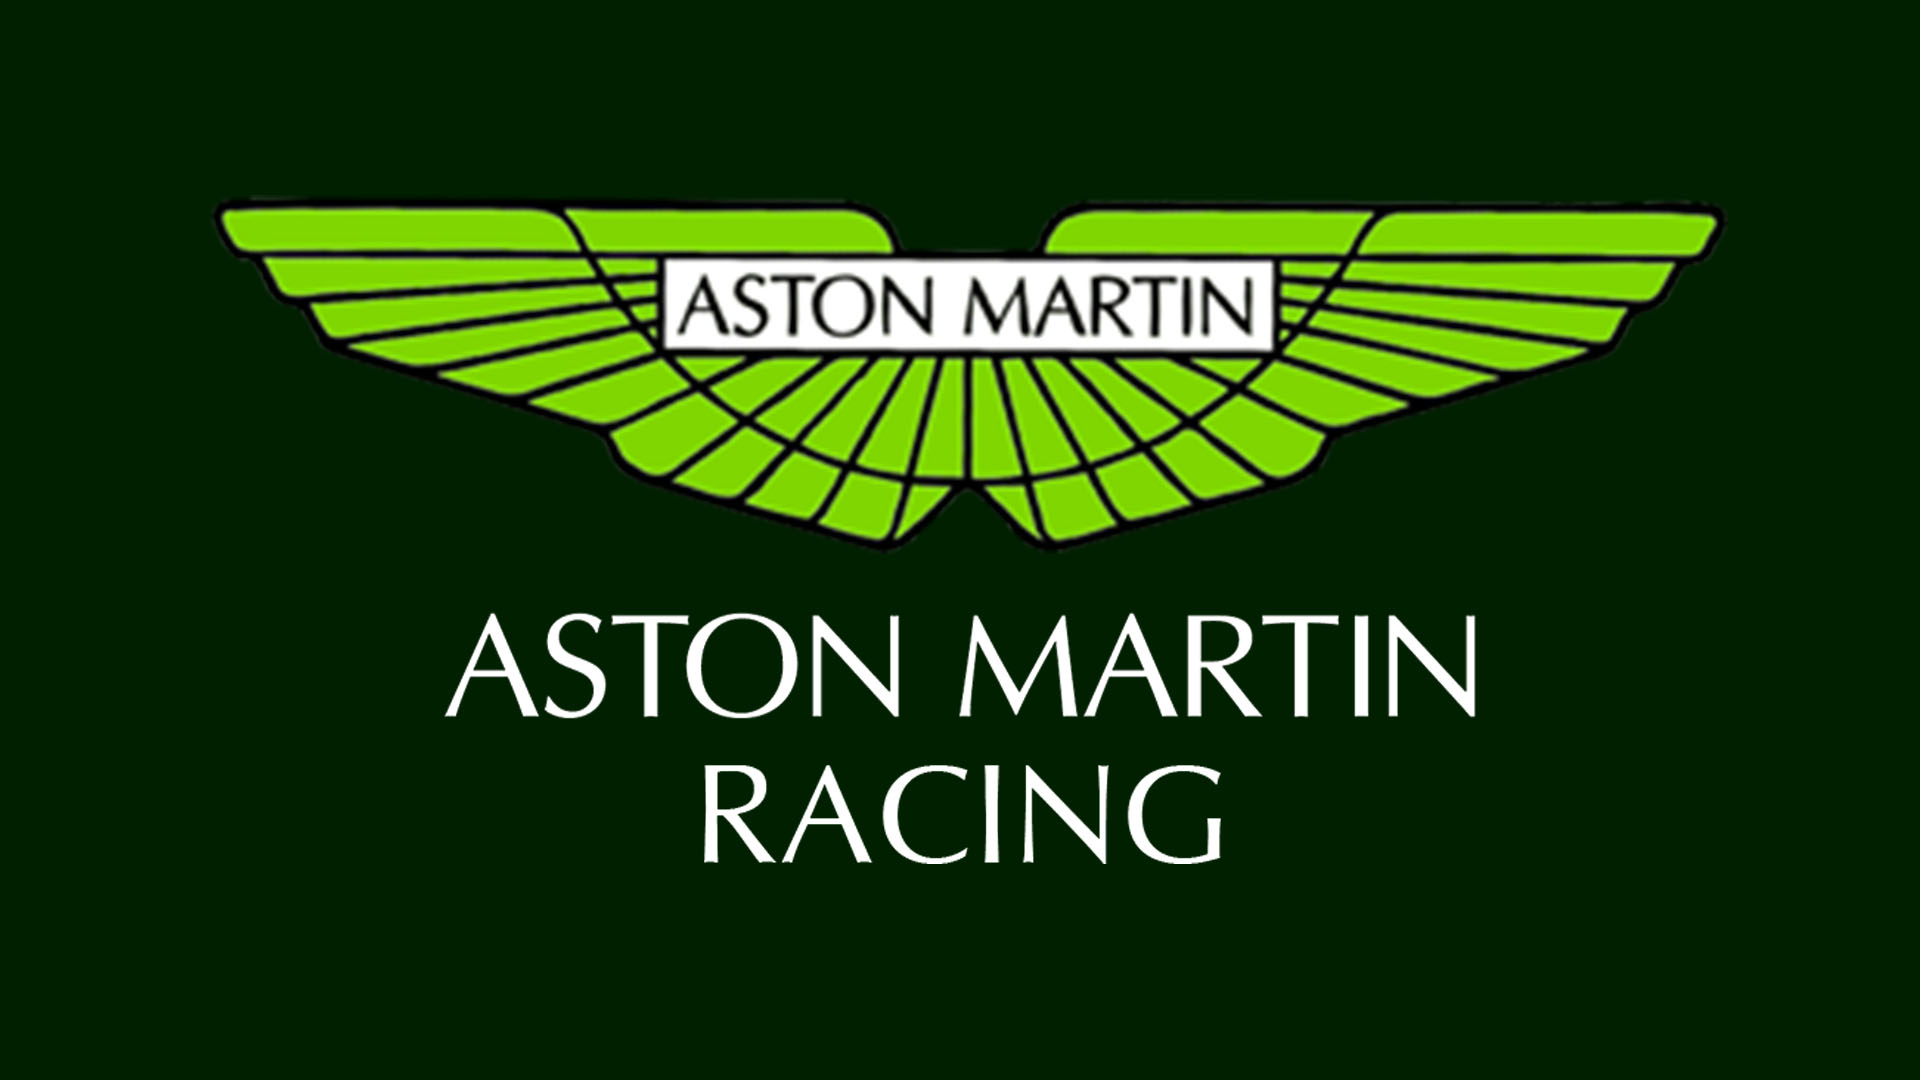 Aston Martin Racing (Full Team) | RaceDepartment